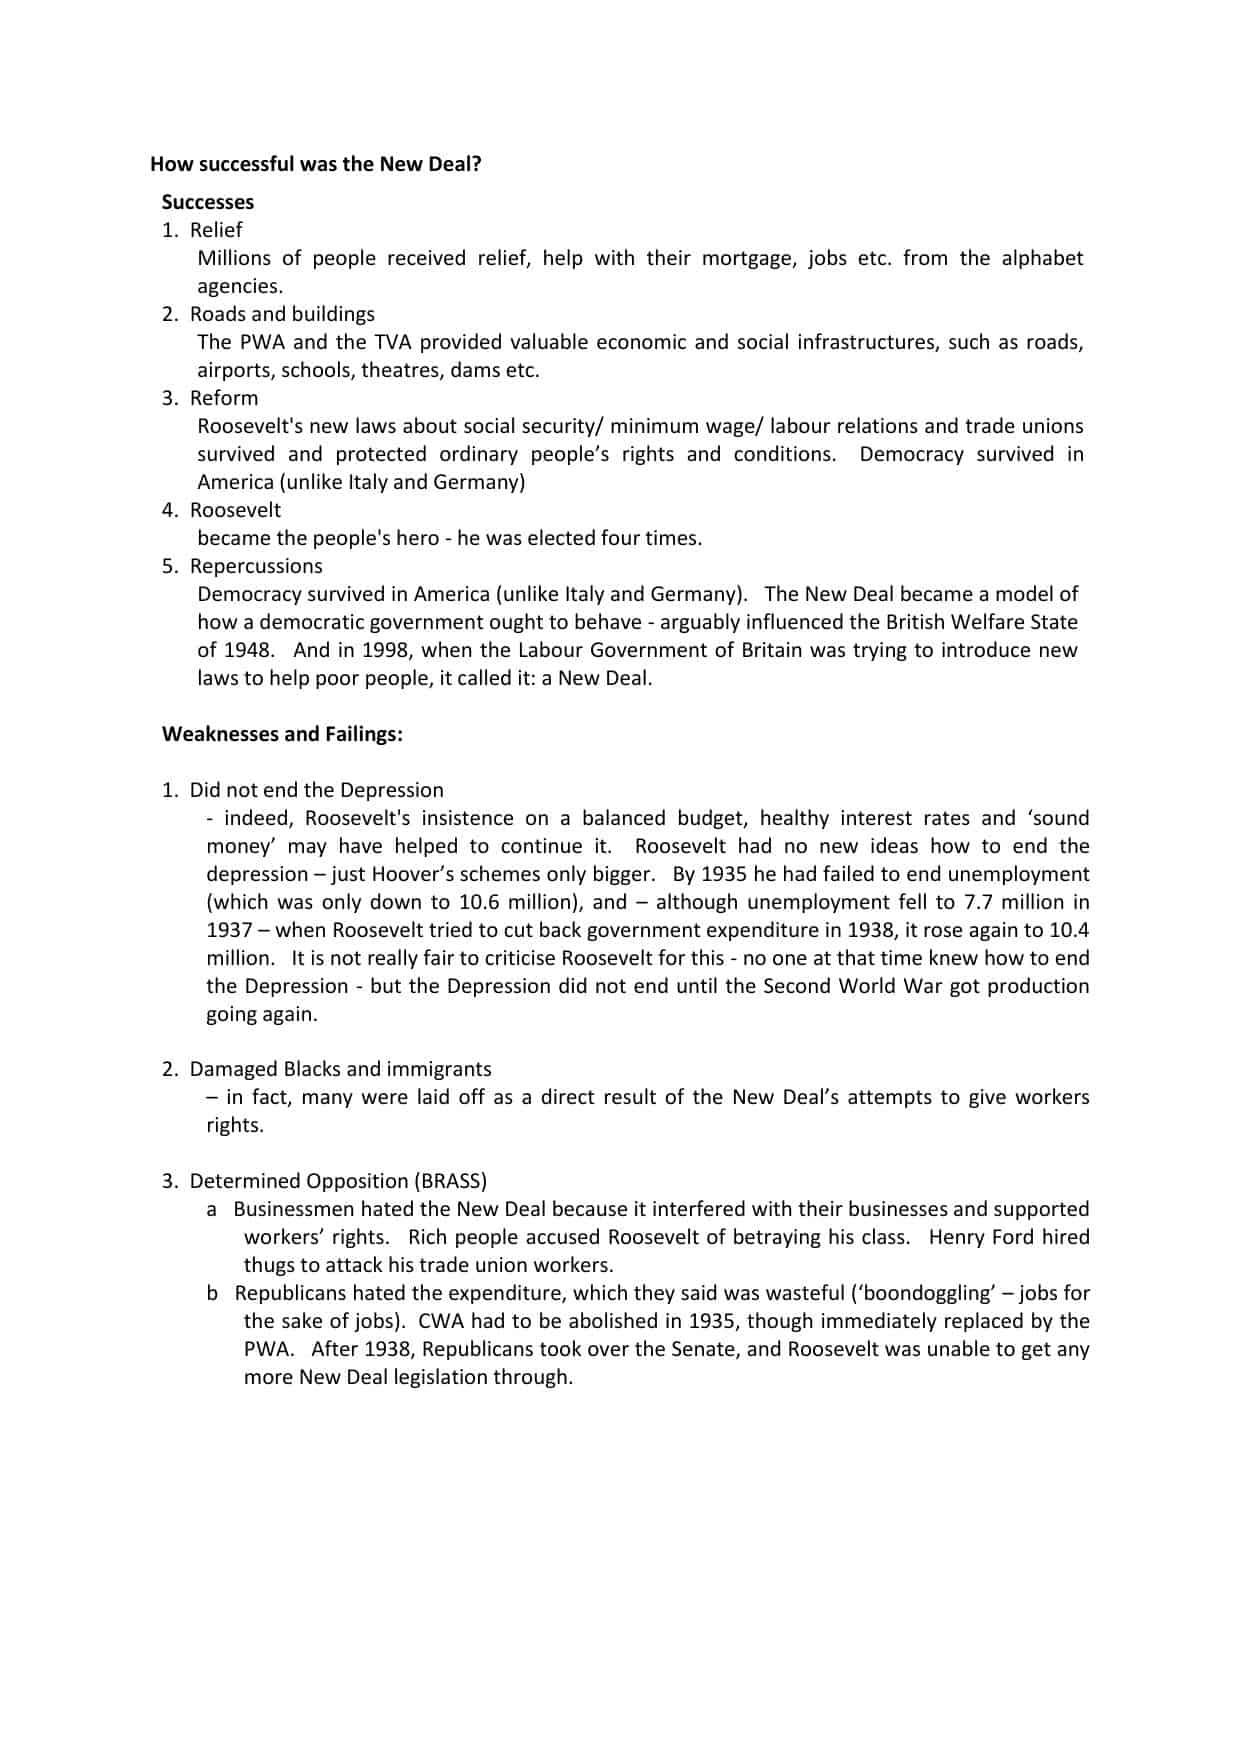 Essay in sanskrit language on diwali